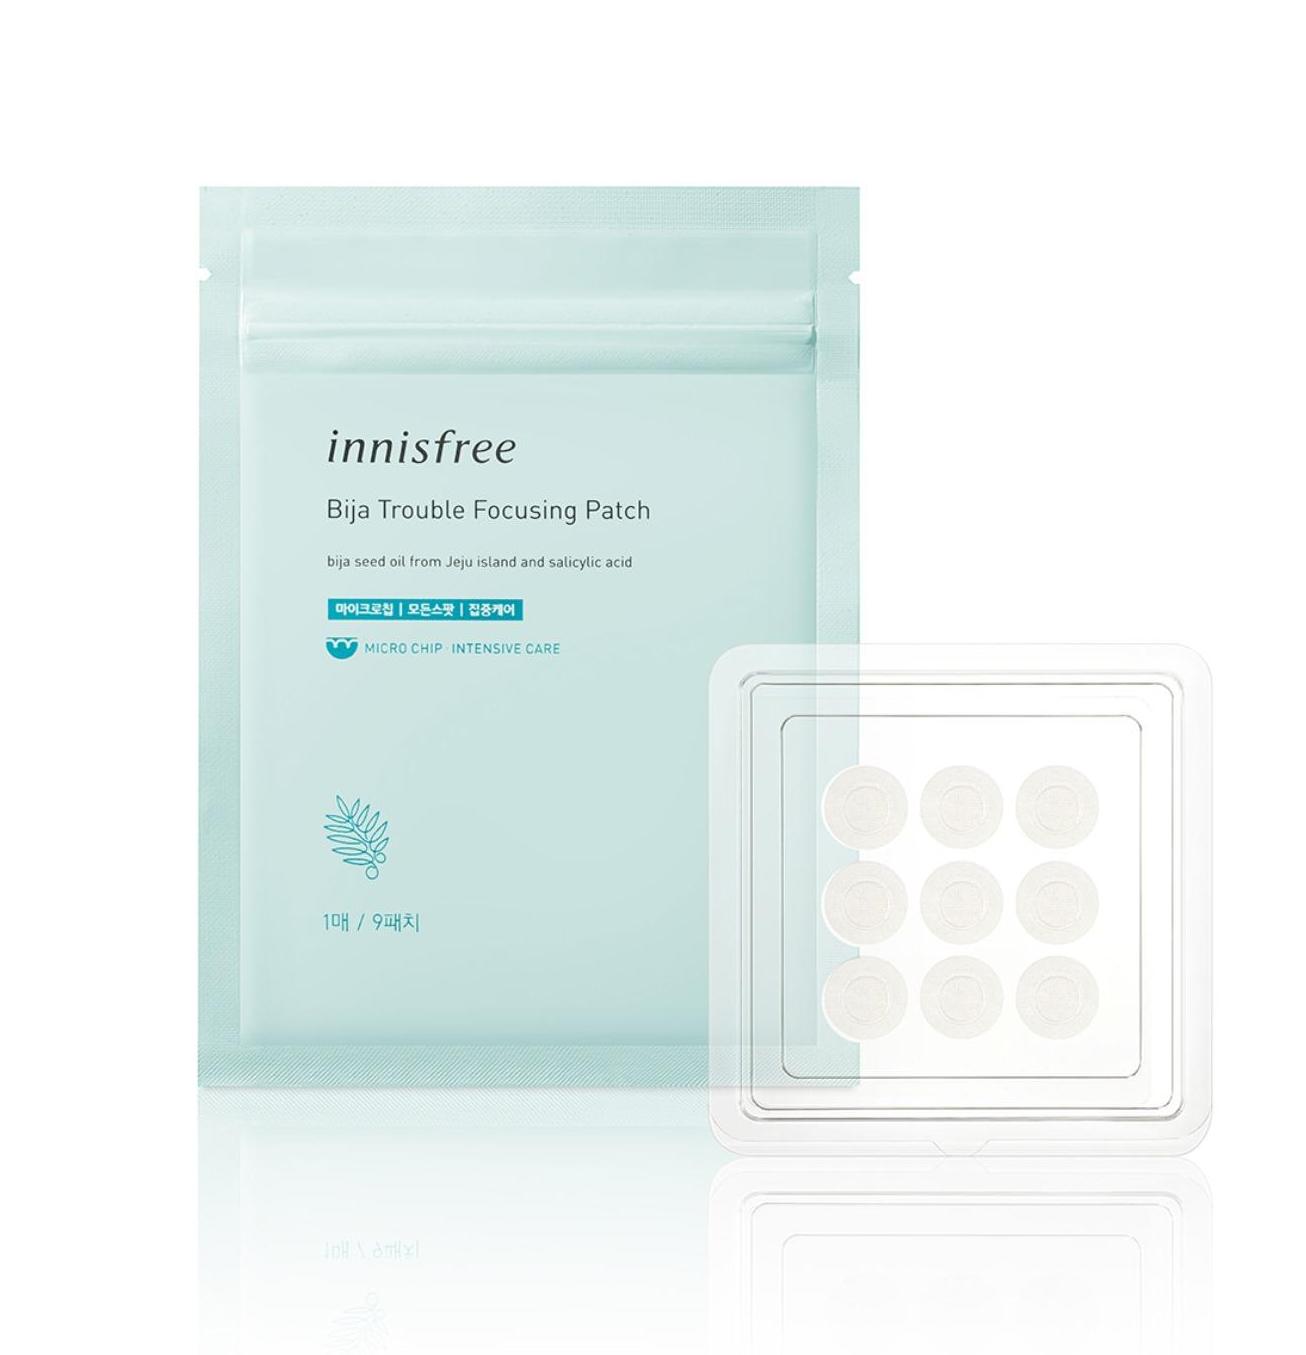 innisfree-bija-trouble-focusing-patch-anti-acne-bouton-imperfection